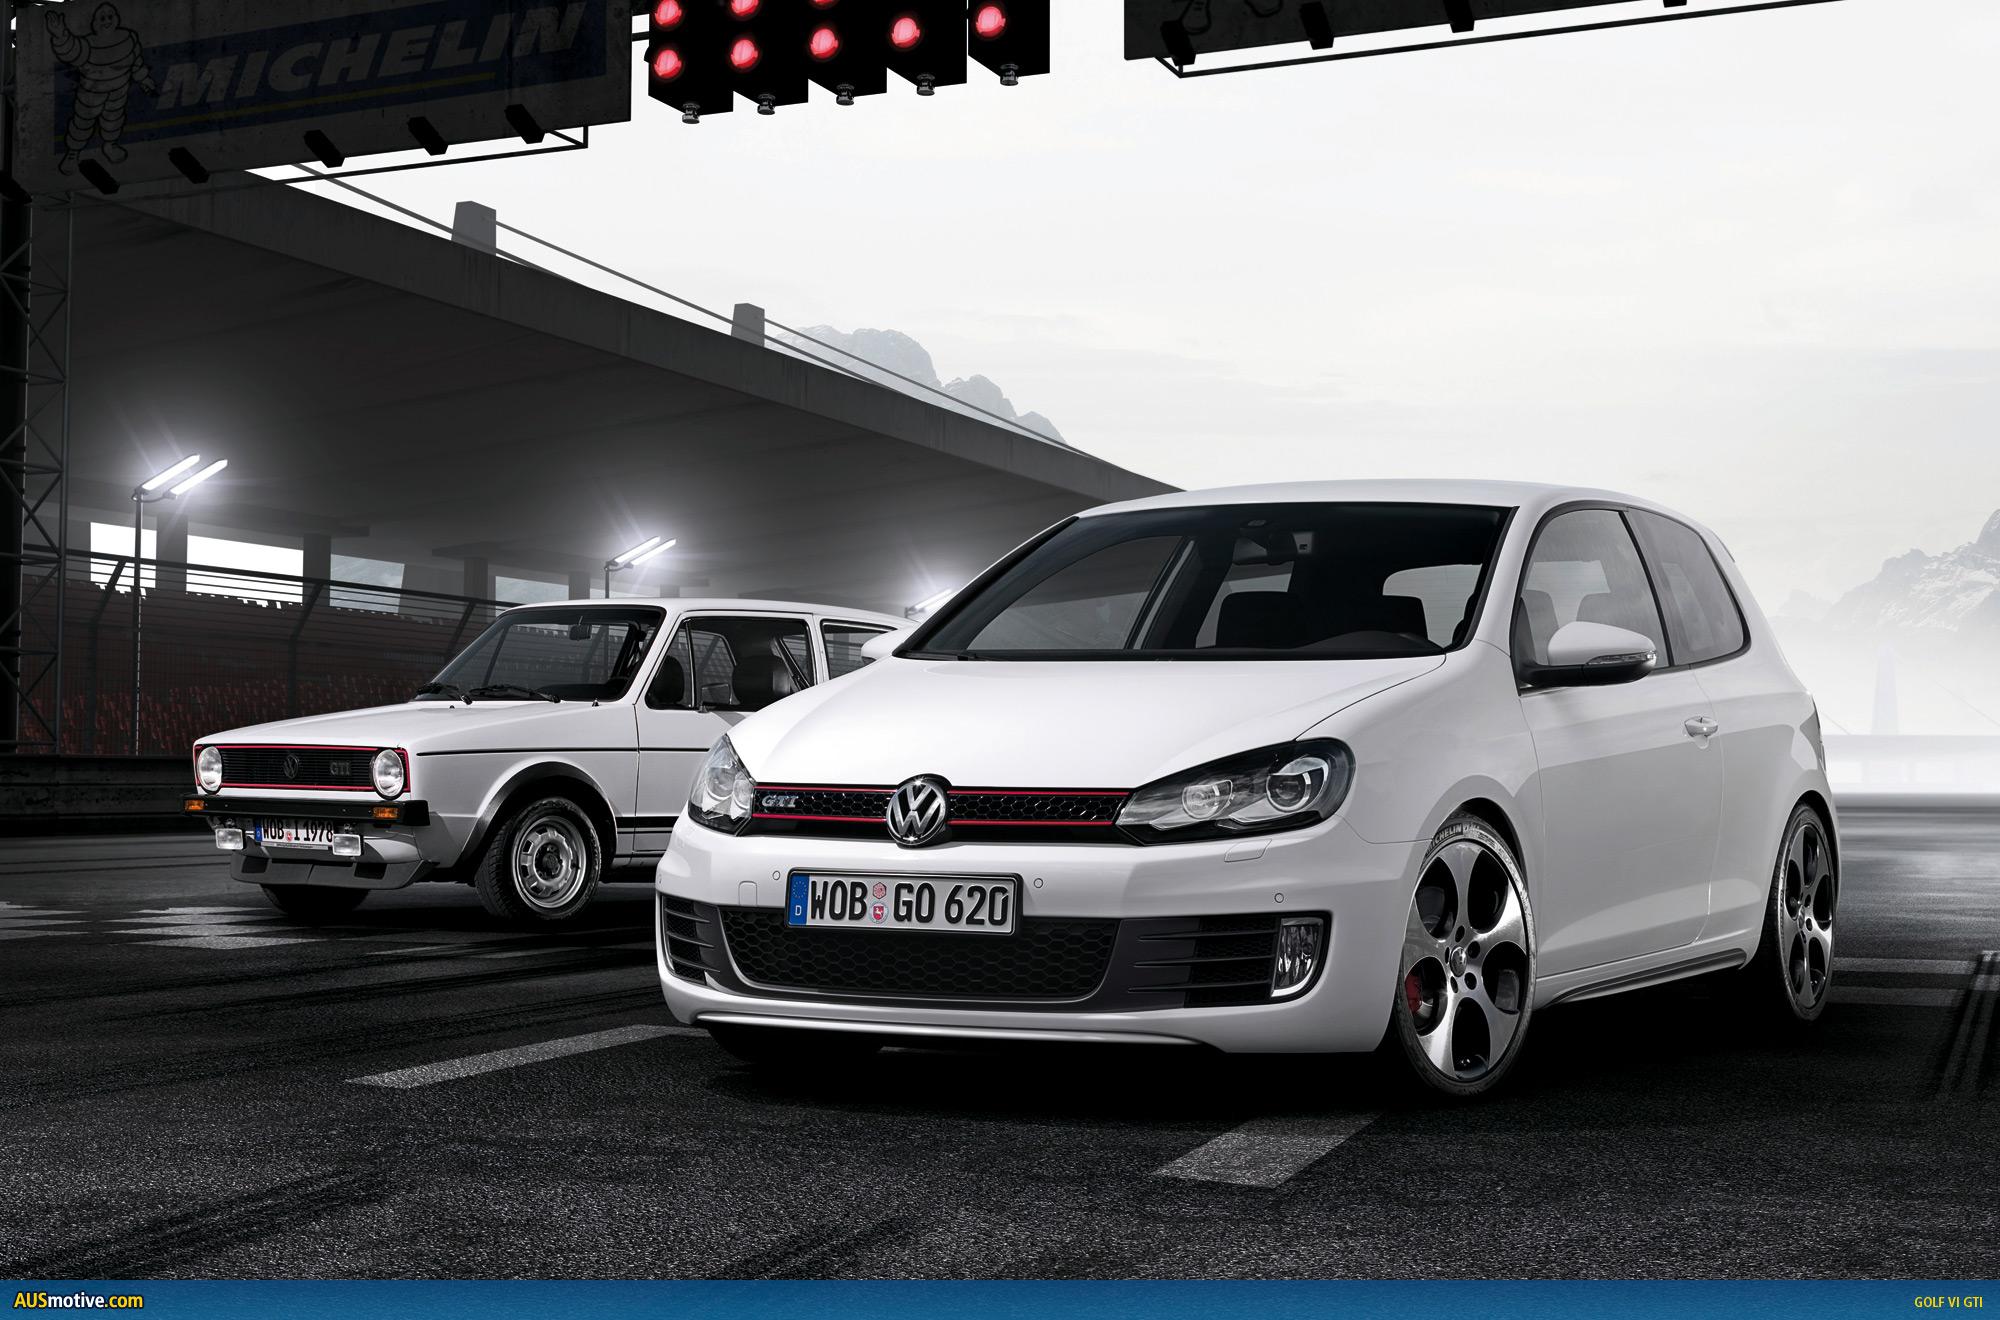 Gallery For Volkswagen Gti Mk6 Wallpaper